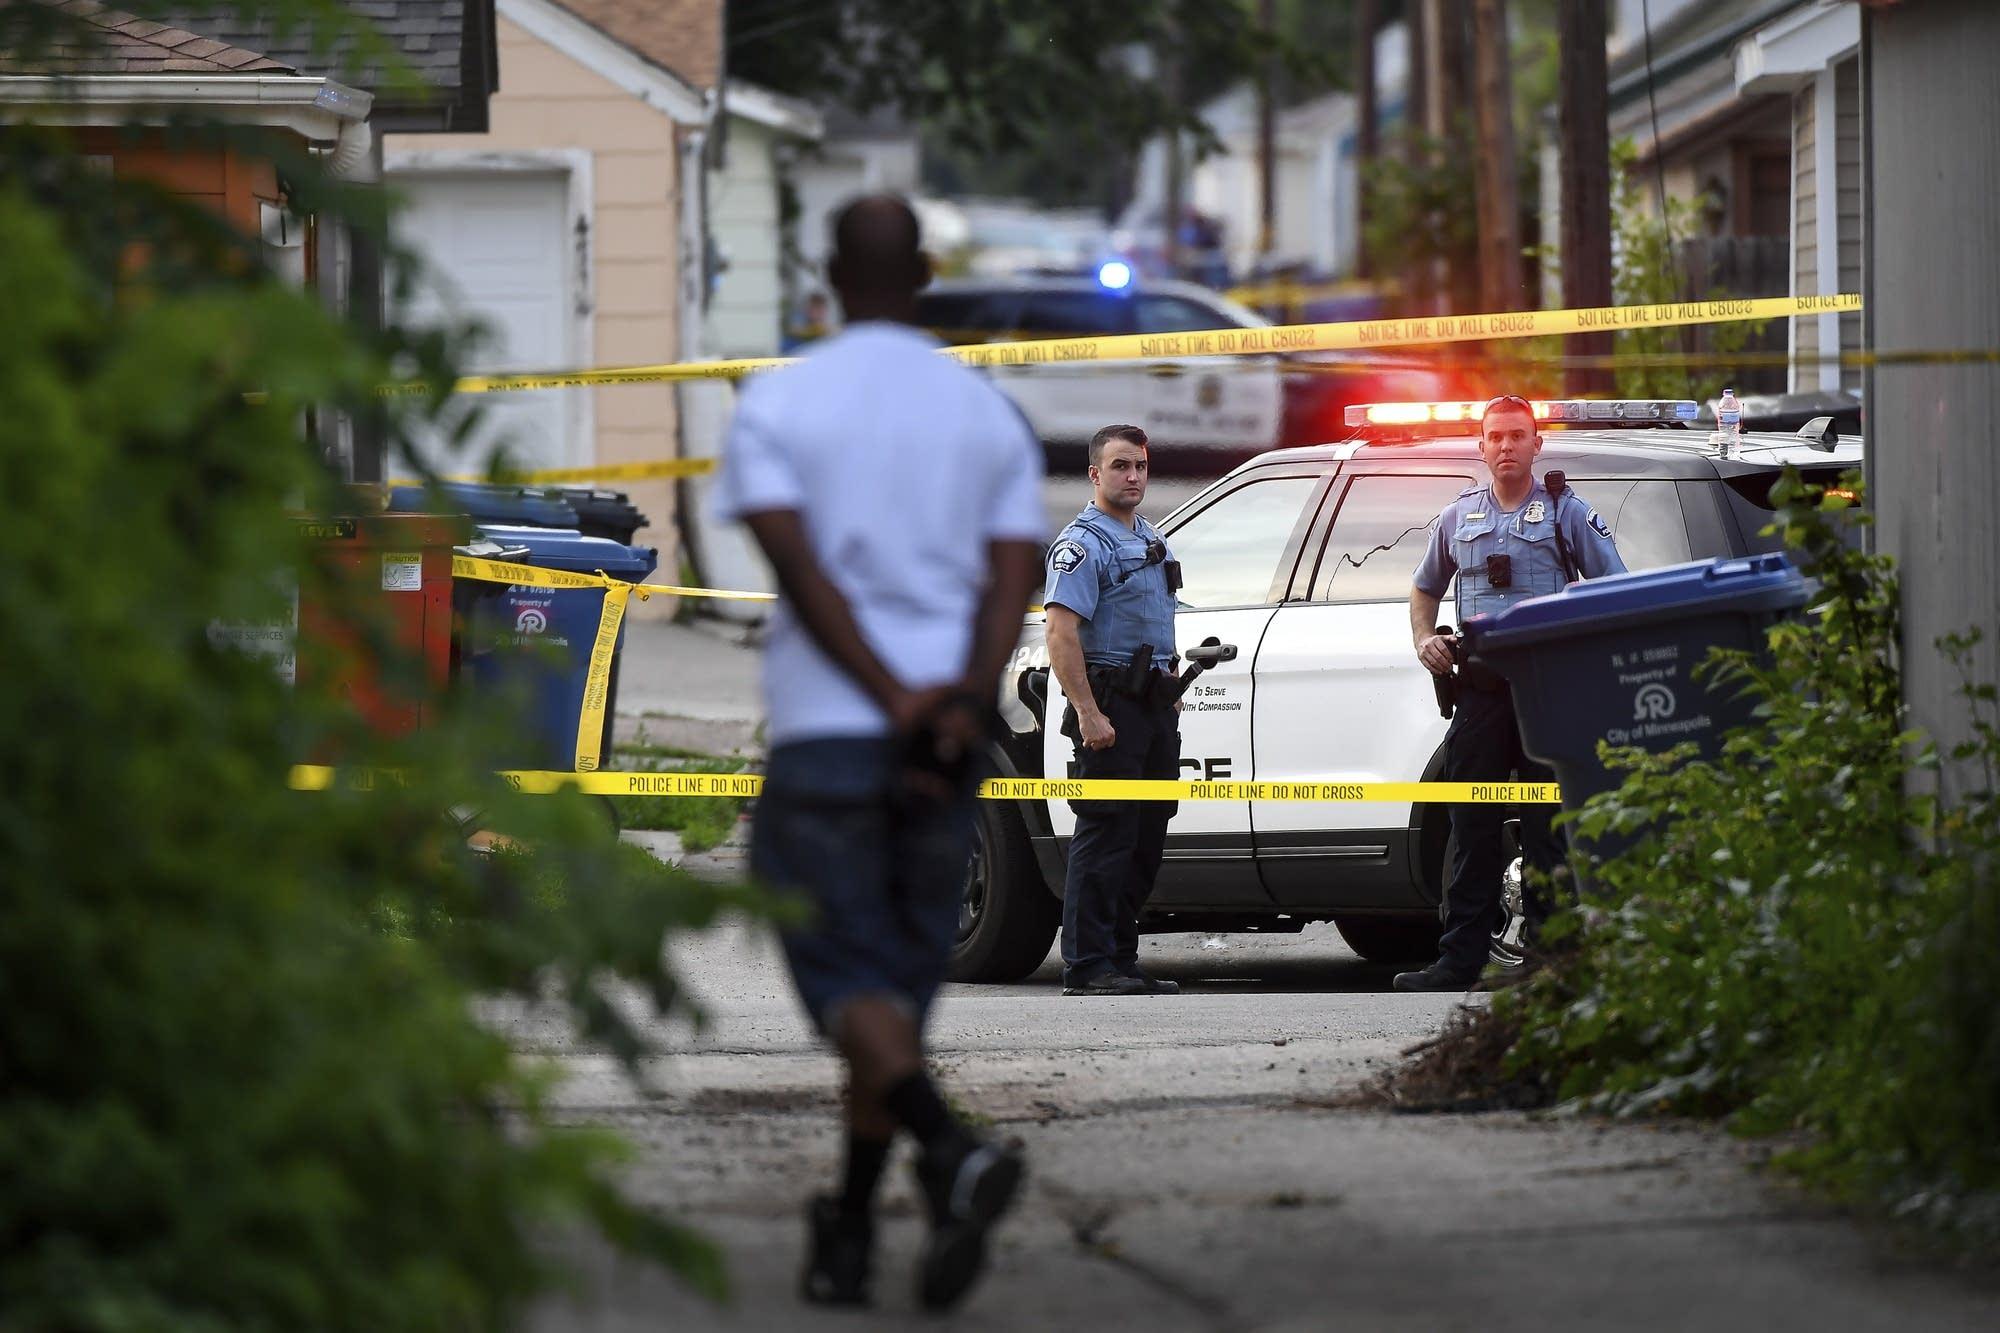 John Thompson arrives at the scene of an officer-involved shooting.